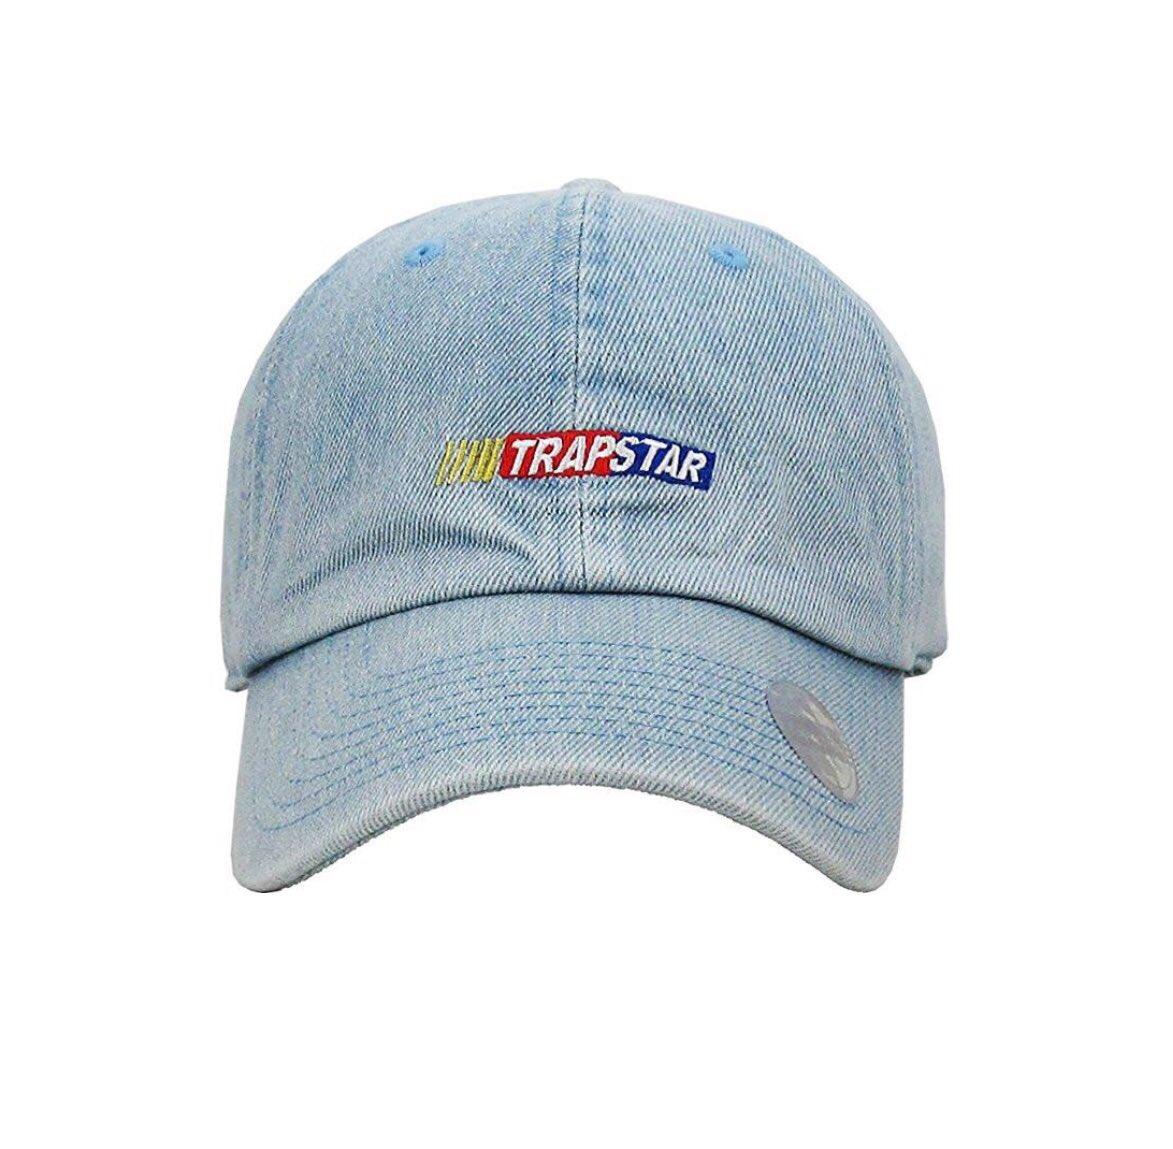 Trapstar Dad Hat 💨  Shop: https://t.co/S...